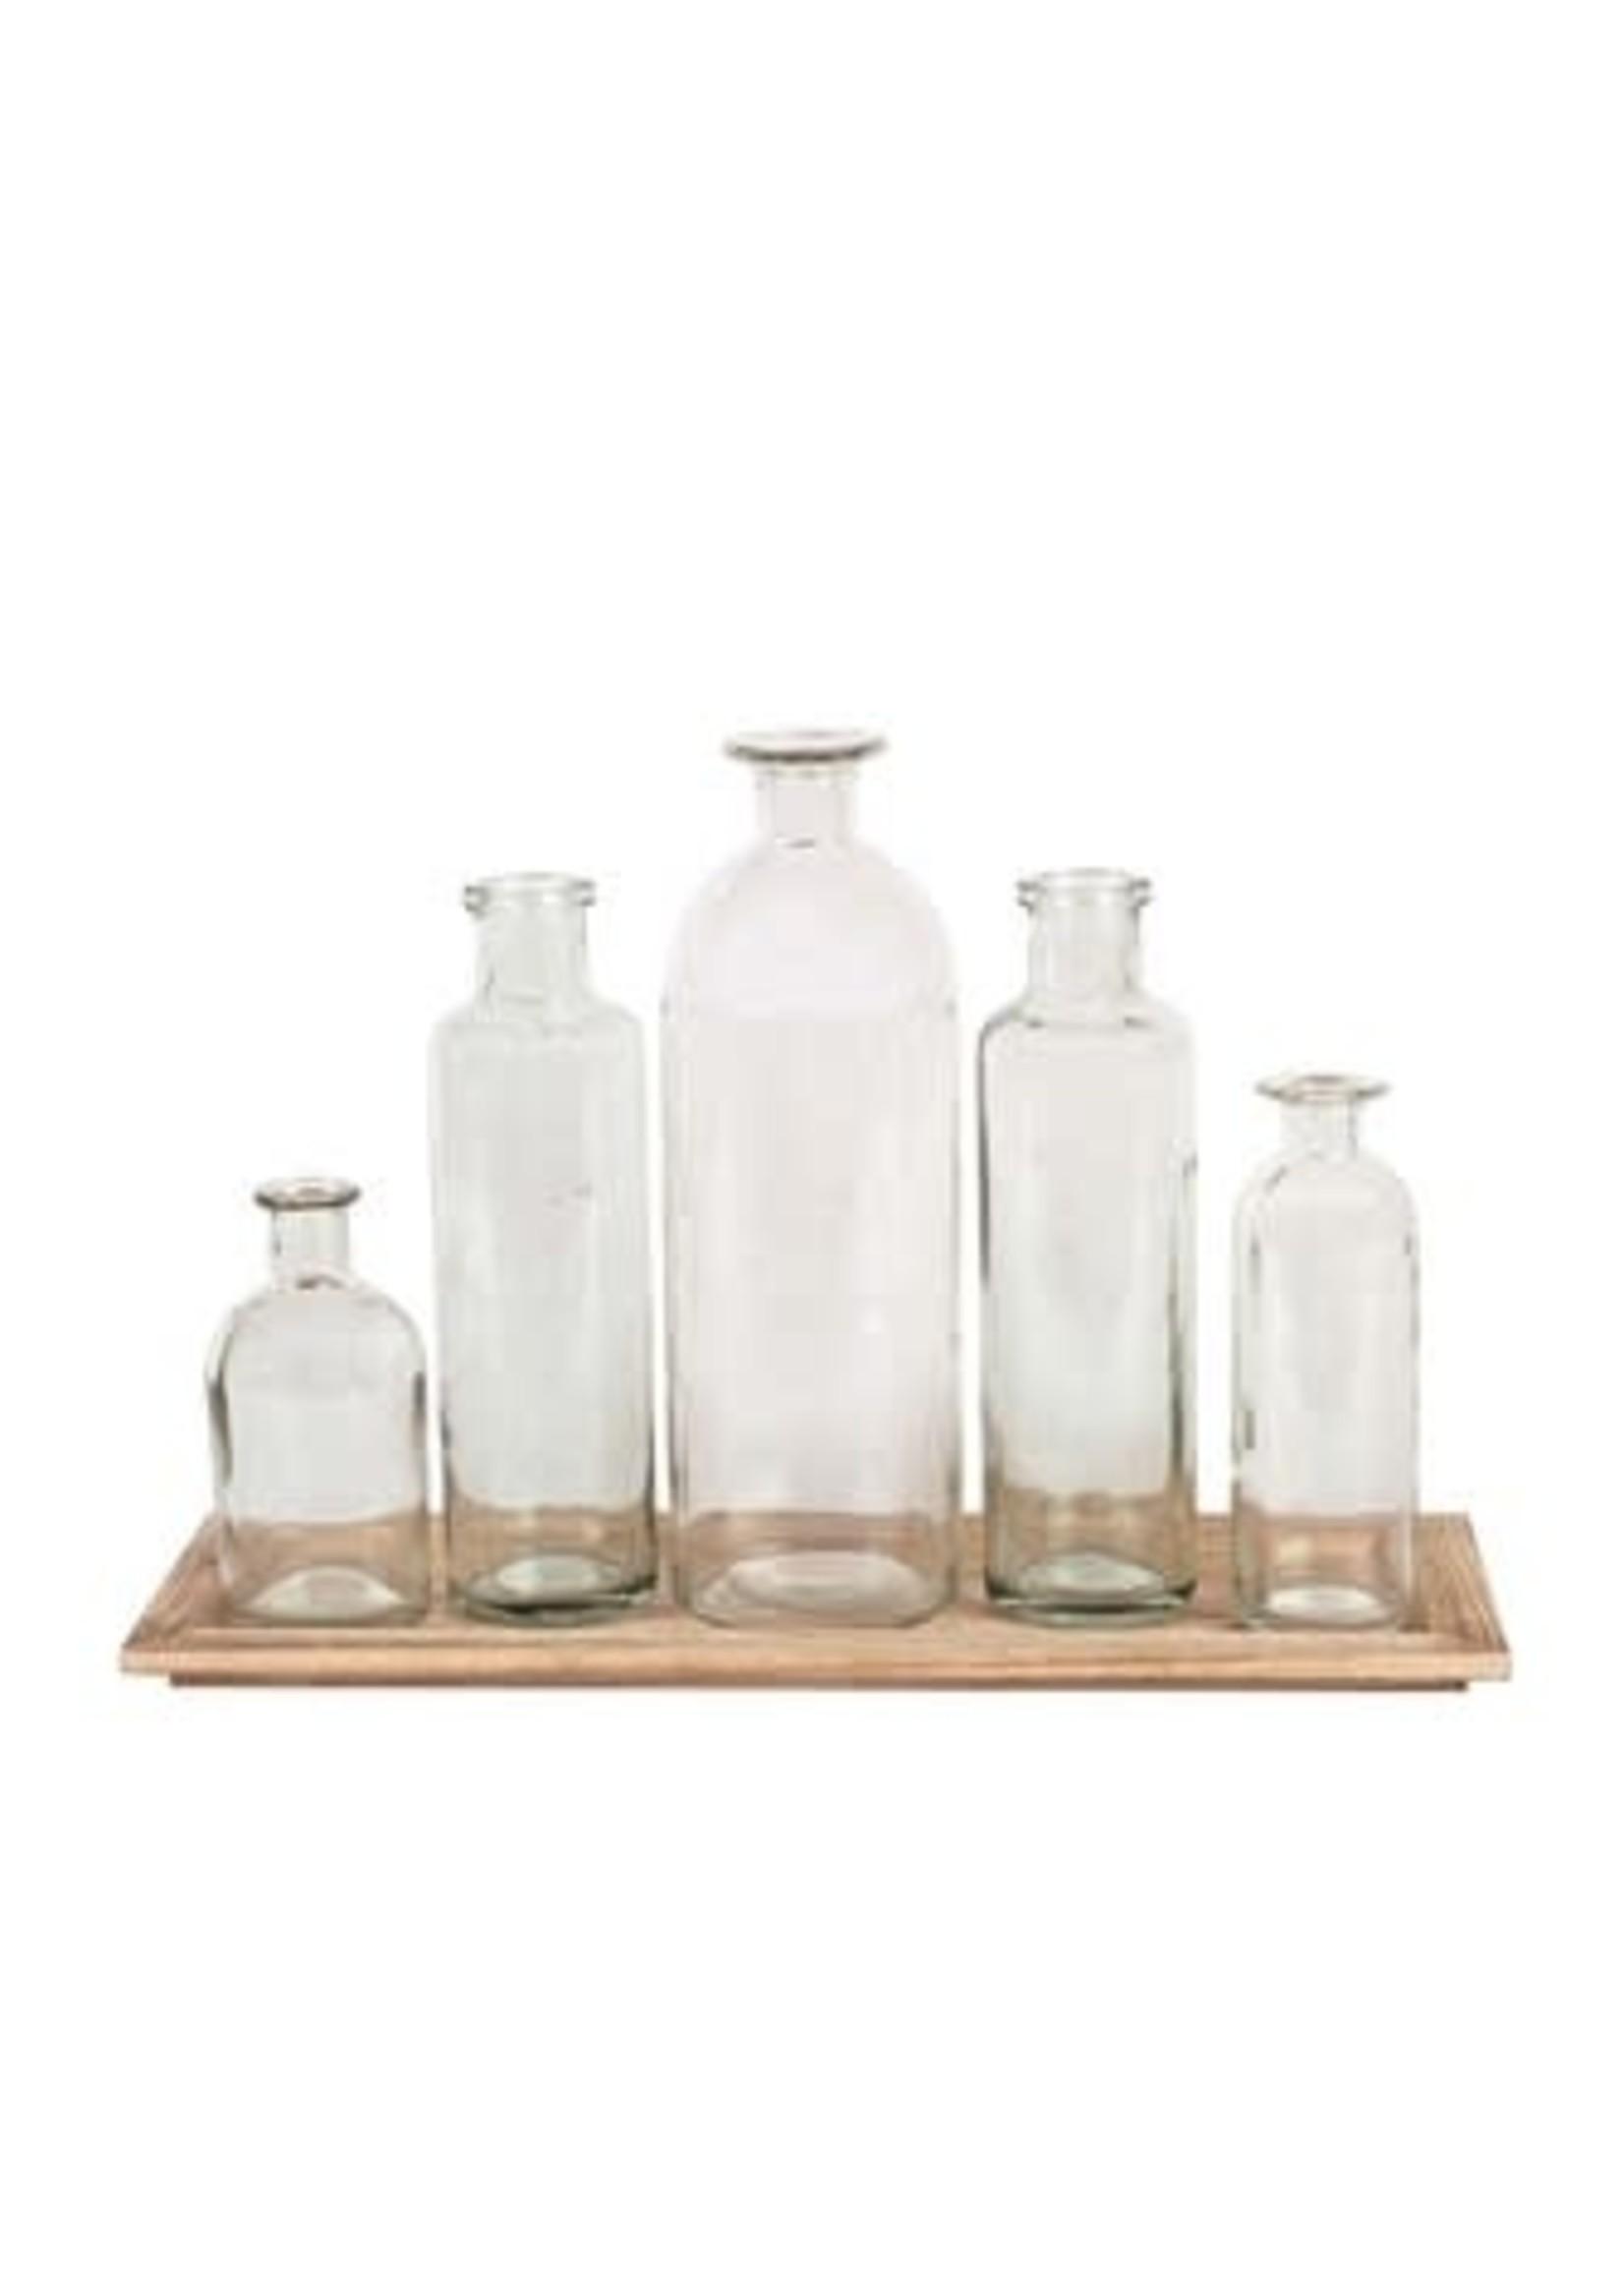 CREATIVE CO-OP DA2672 WOOD TRAY W/ 5 GLASS BOTTLE VASES